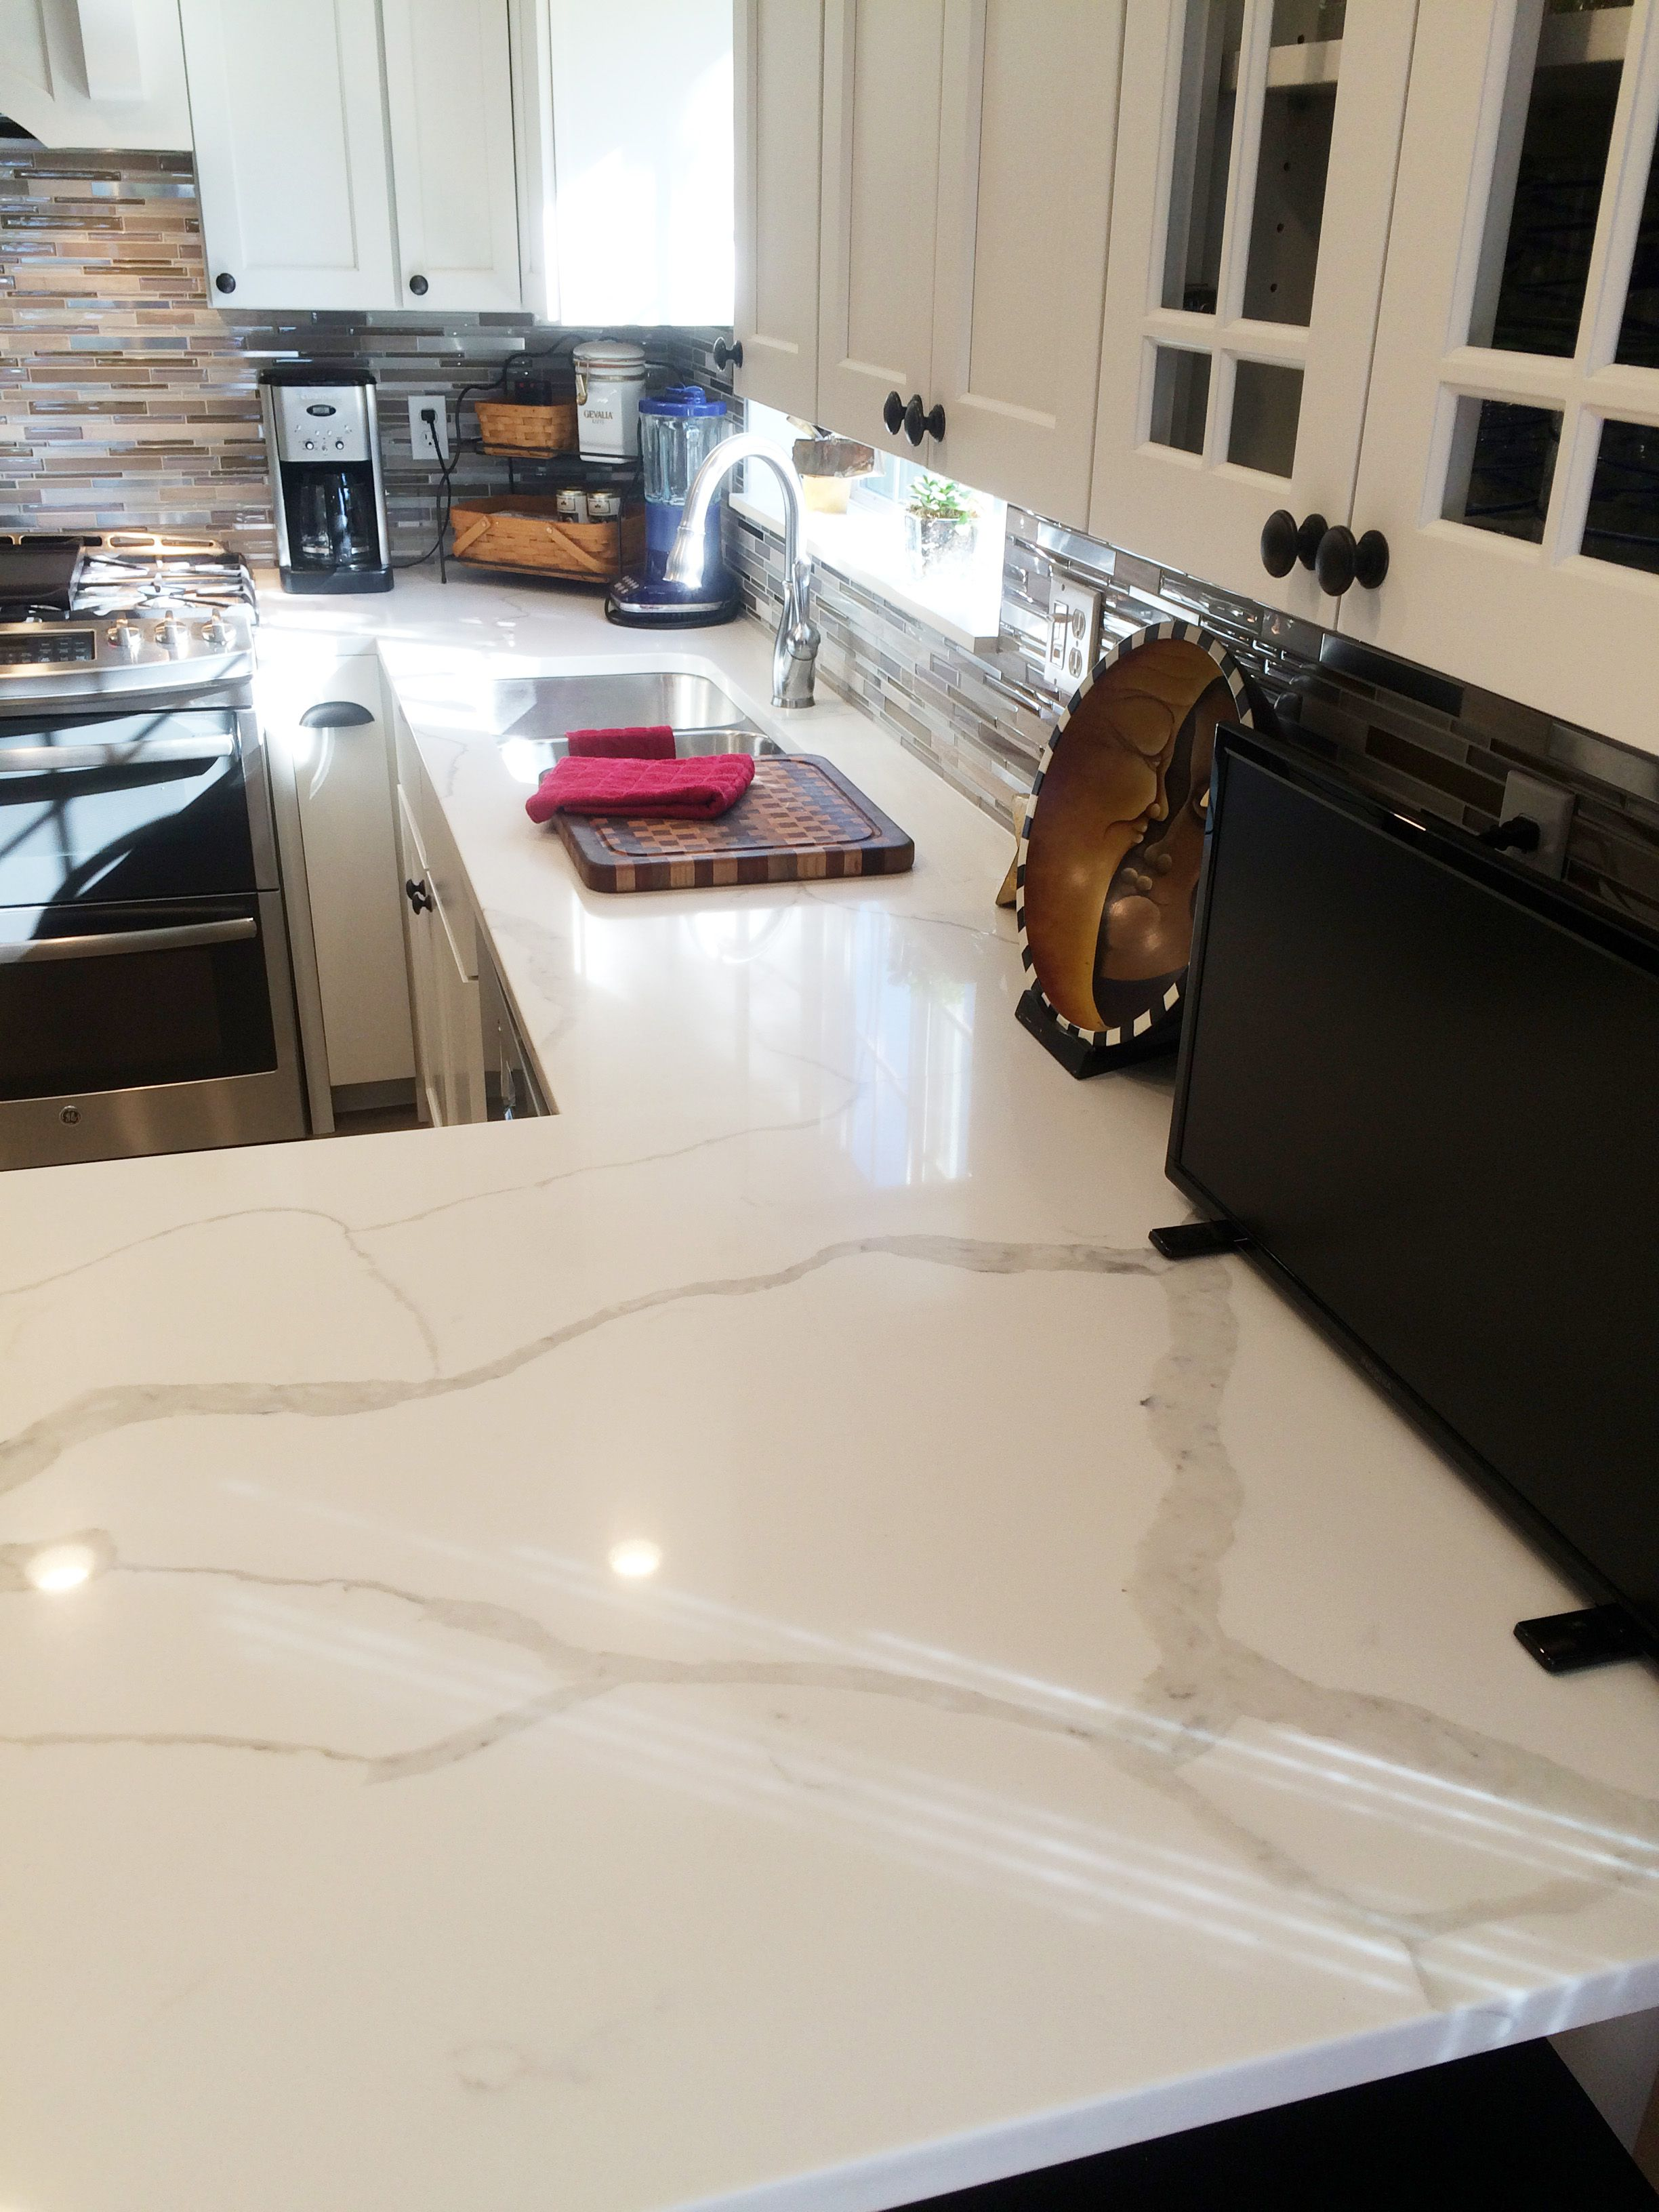 Best Colorquartz Calacatta Novus Quartz Kitchen Counter 400 x 300